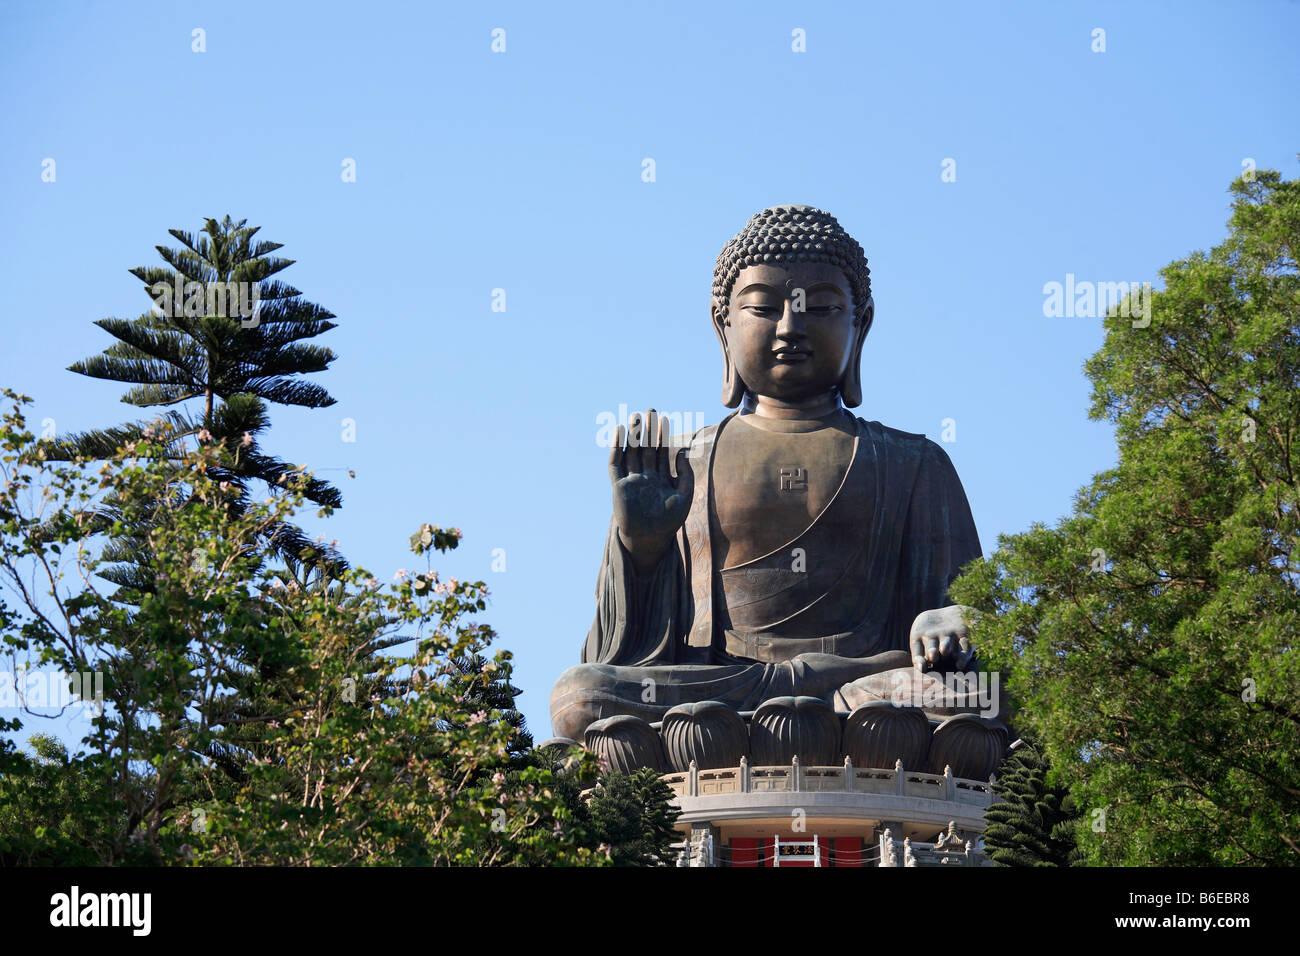 China Hong Kong Lantau Island Tian Tan Buddha statue - Stock Image